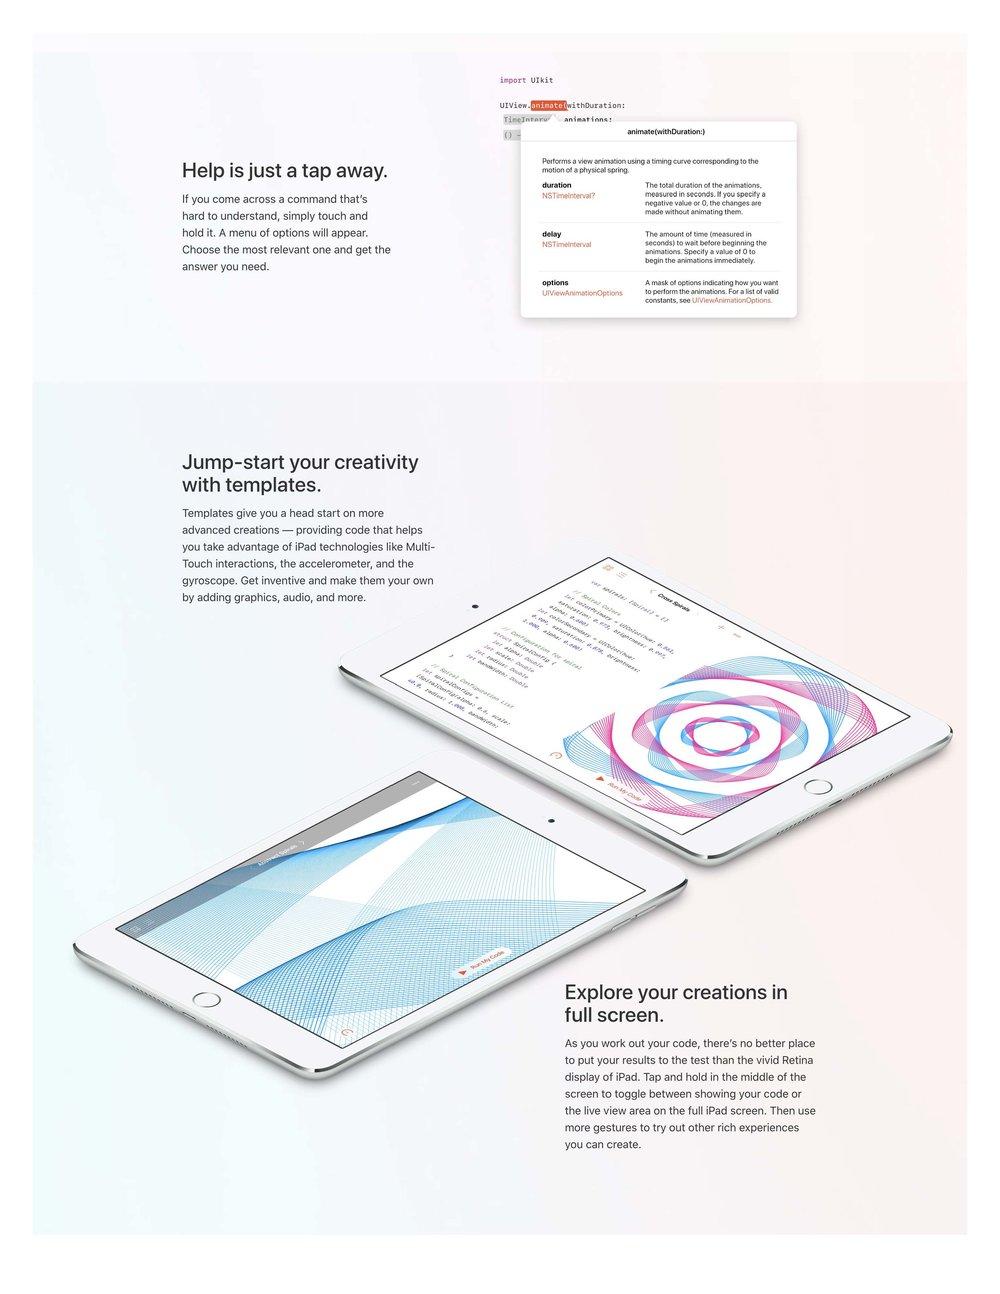 screencapture-apple-swift-playgrounds-2019-03-10-12_50_37_Page_7.jpg